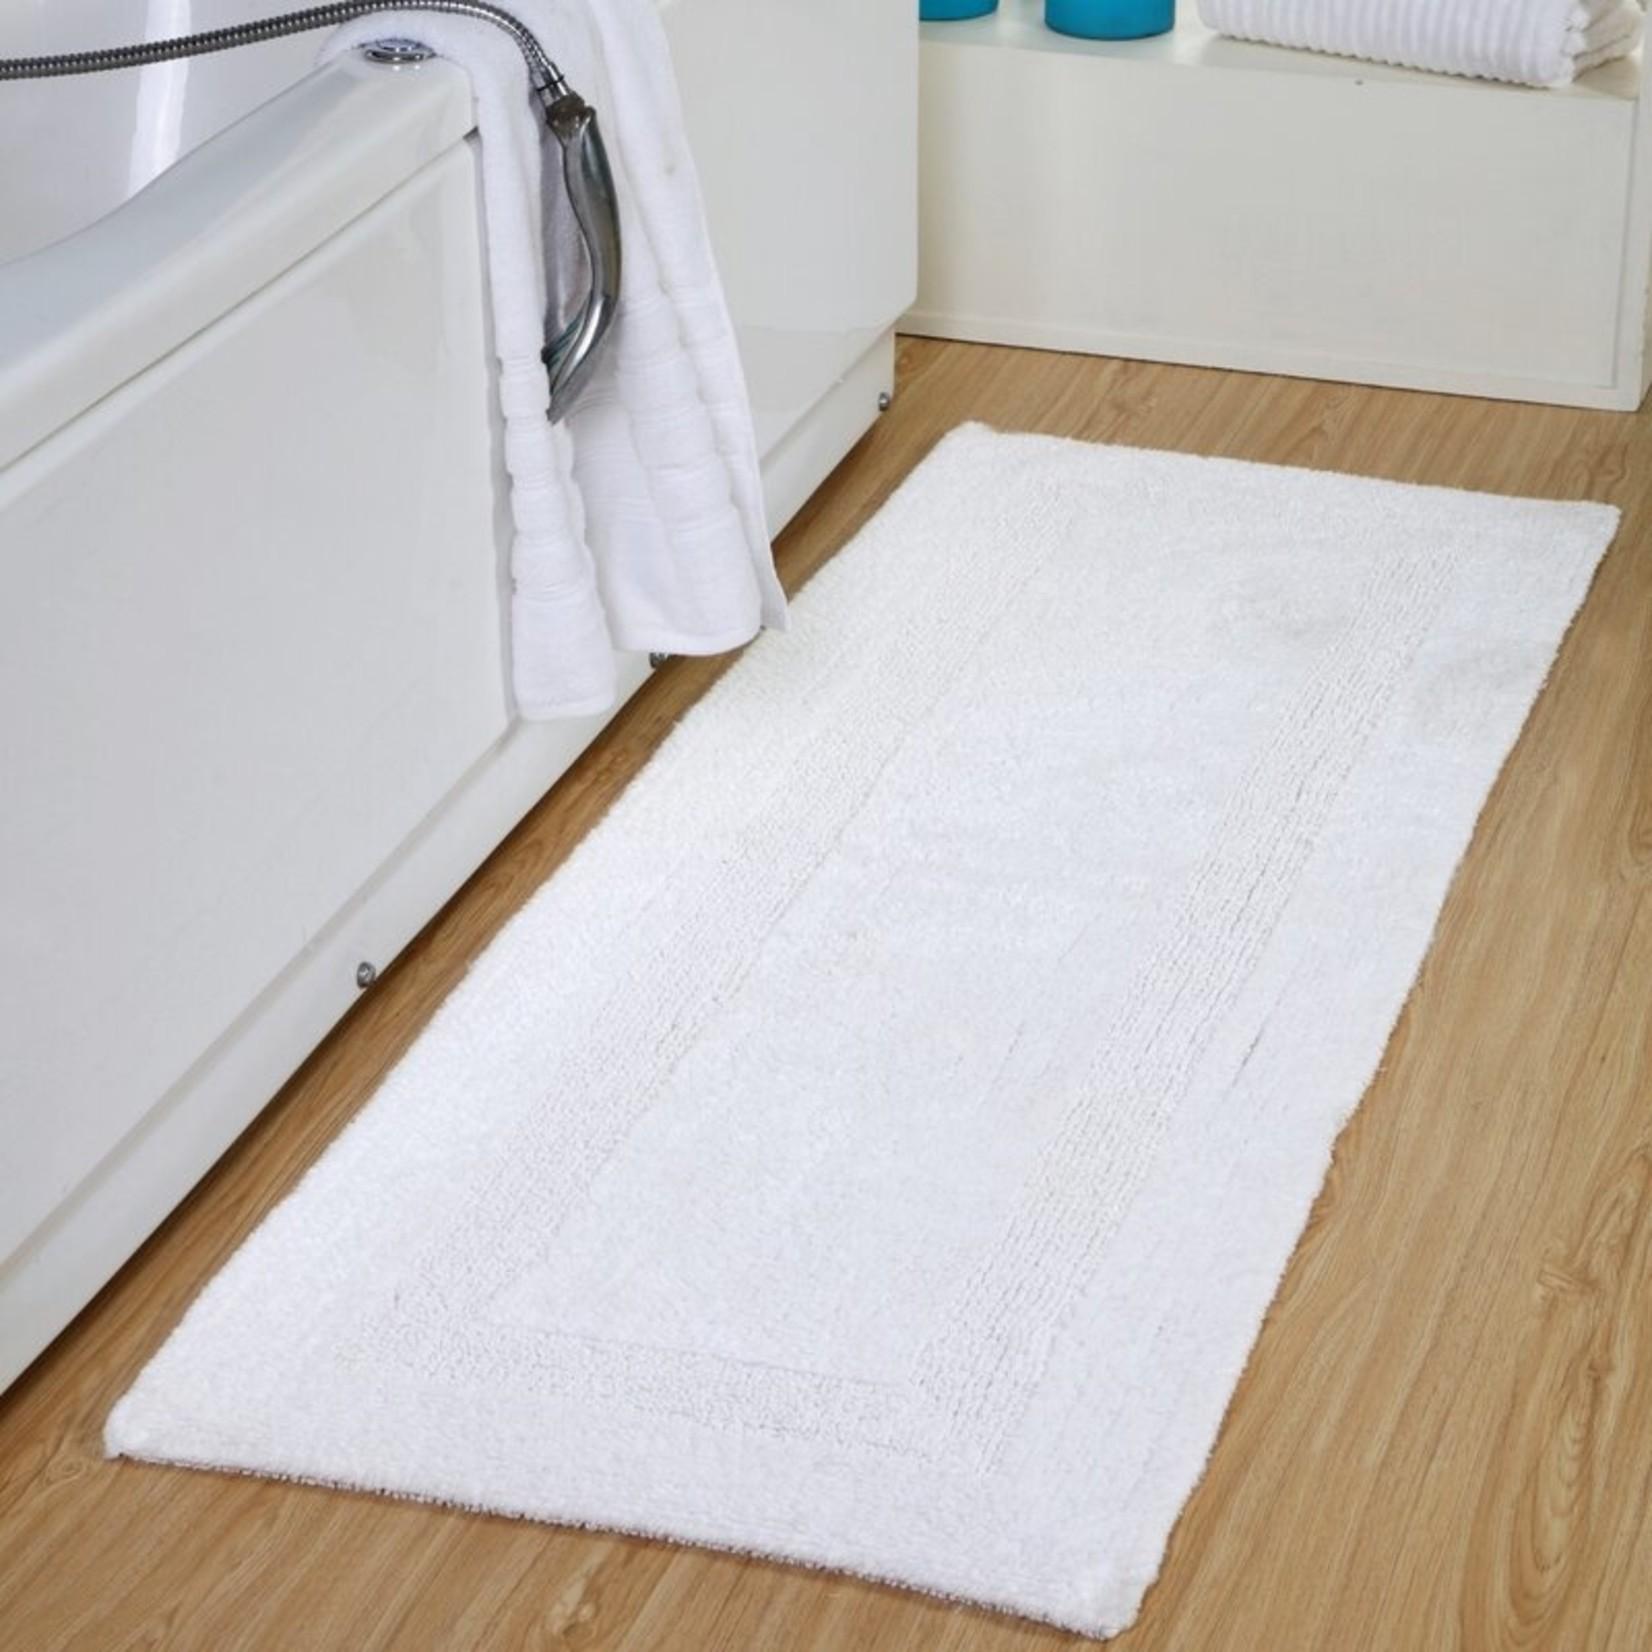 "*24"" x 60"" Tinsley Bath Rug - White"